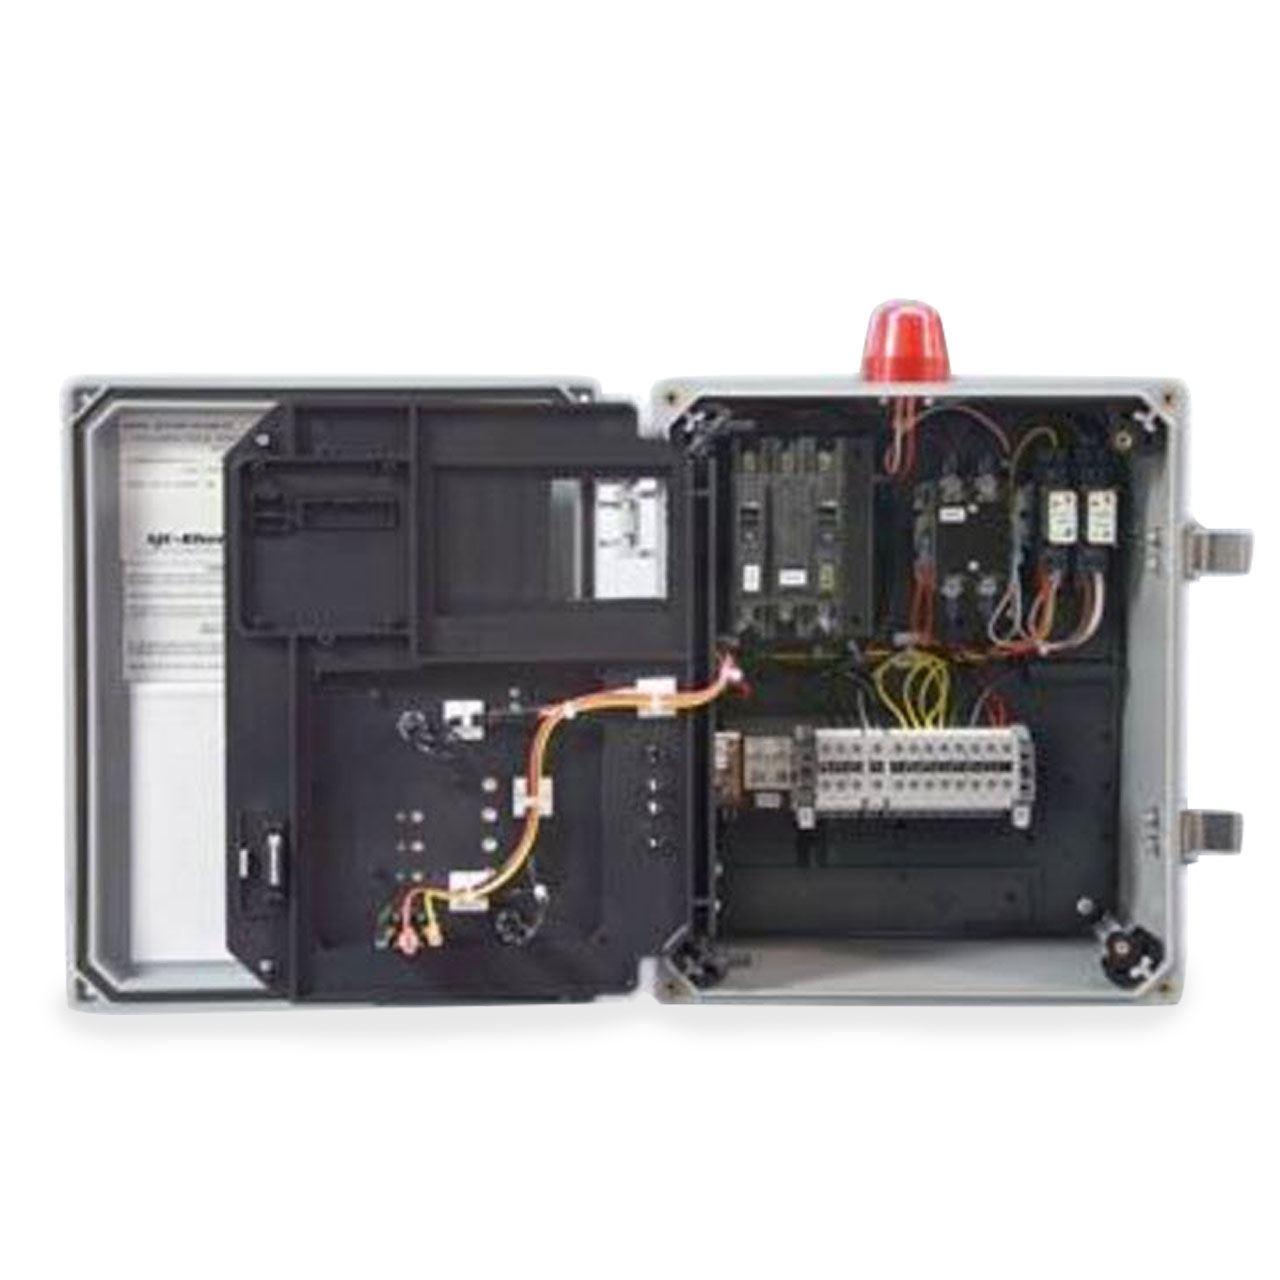 sje rhombus sje rhombus rls relay logic series motor contactor rh rcworst com Fuel Pump Wiring Harness Diagram Fuel System Wiring Diagram